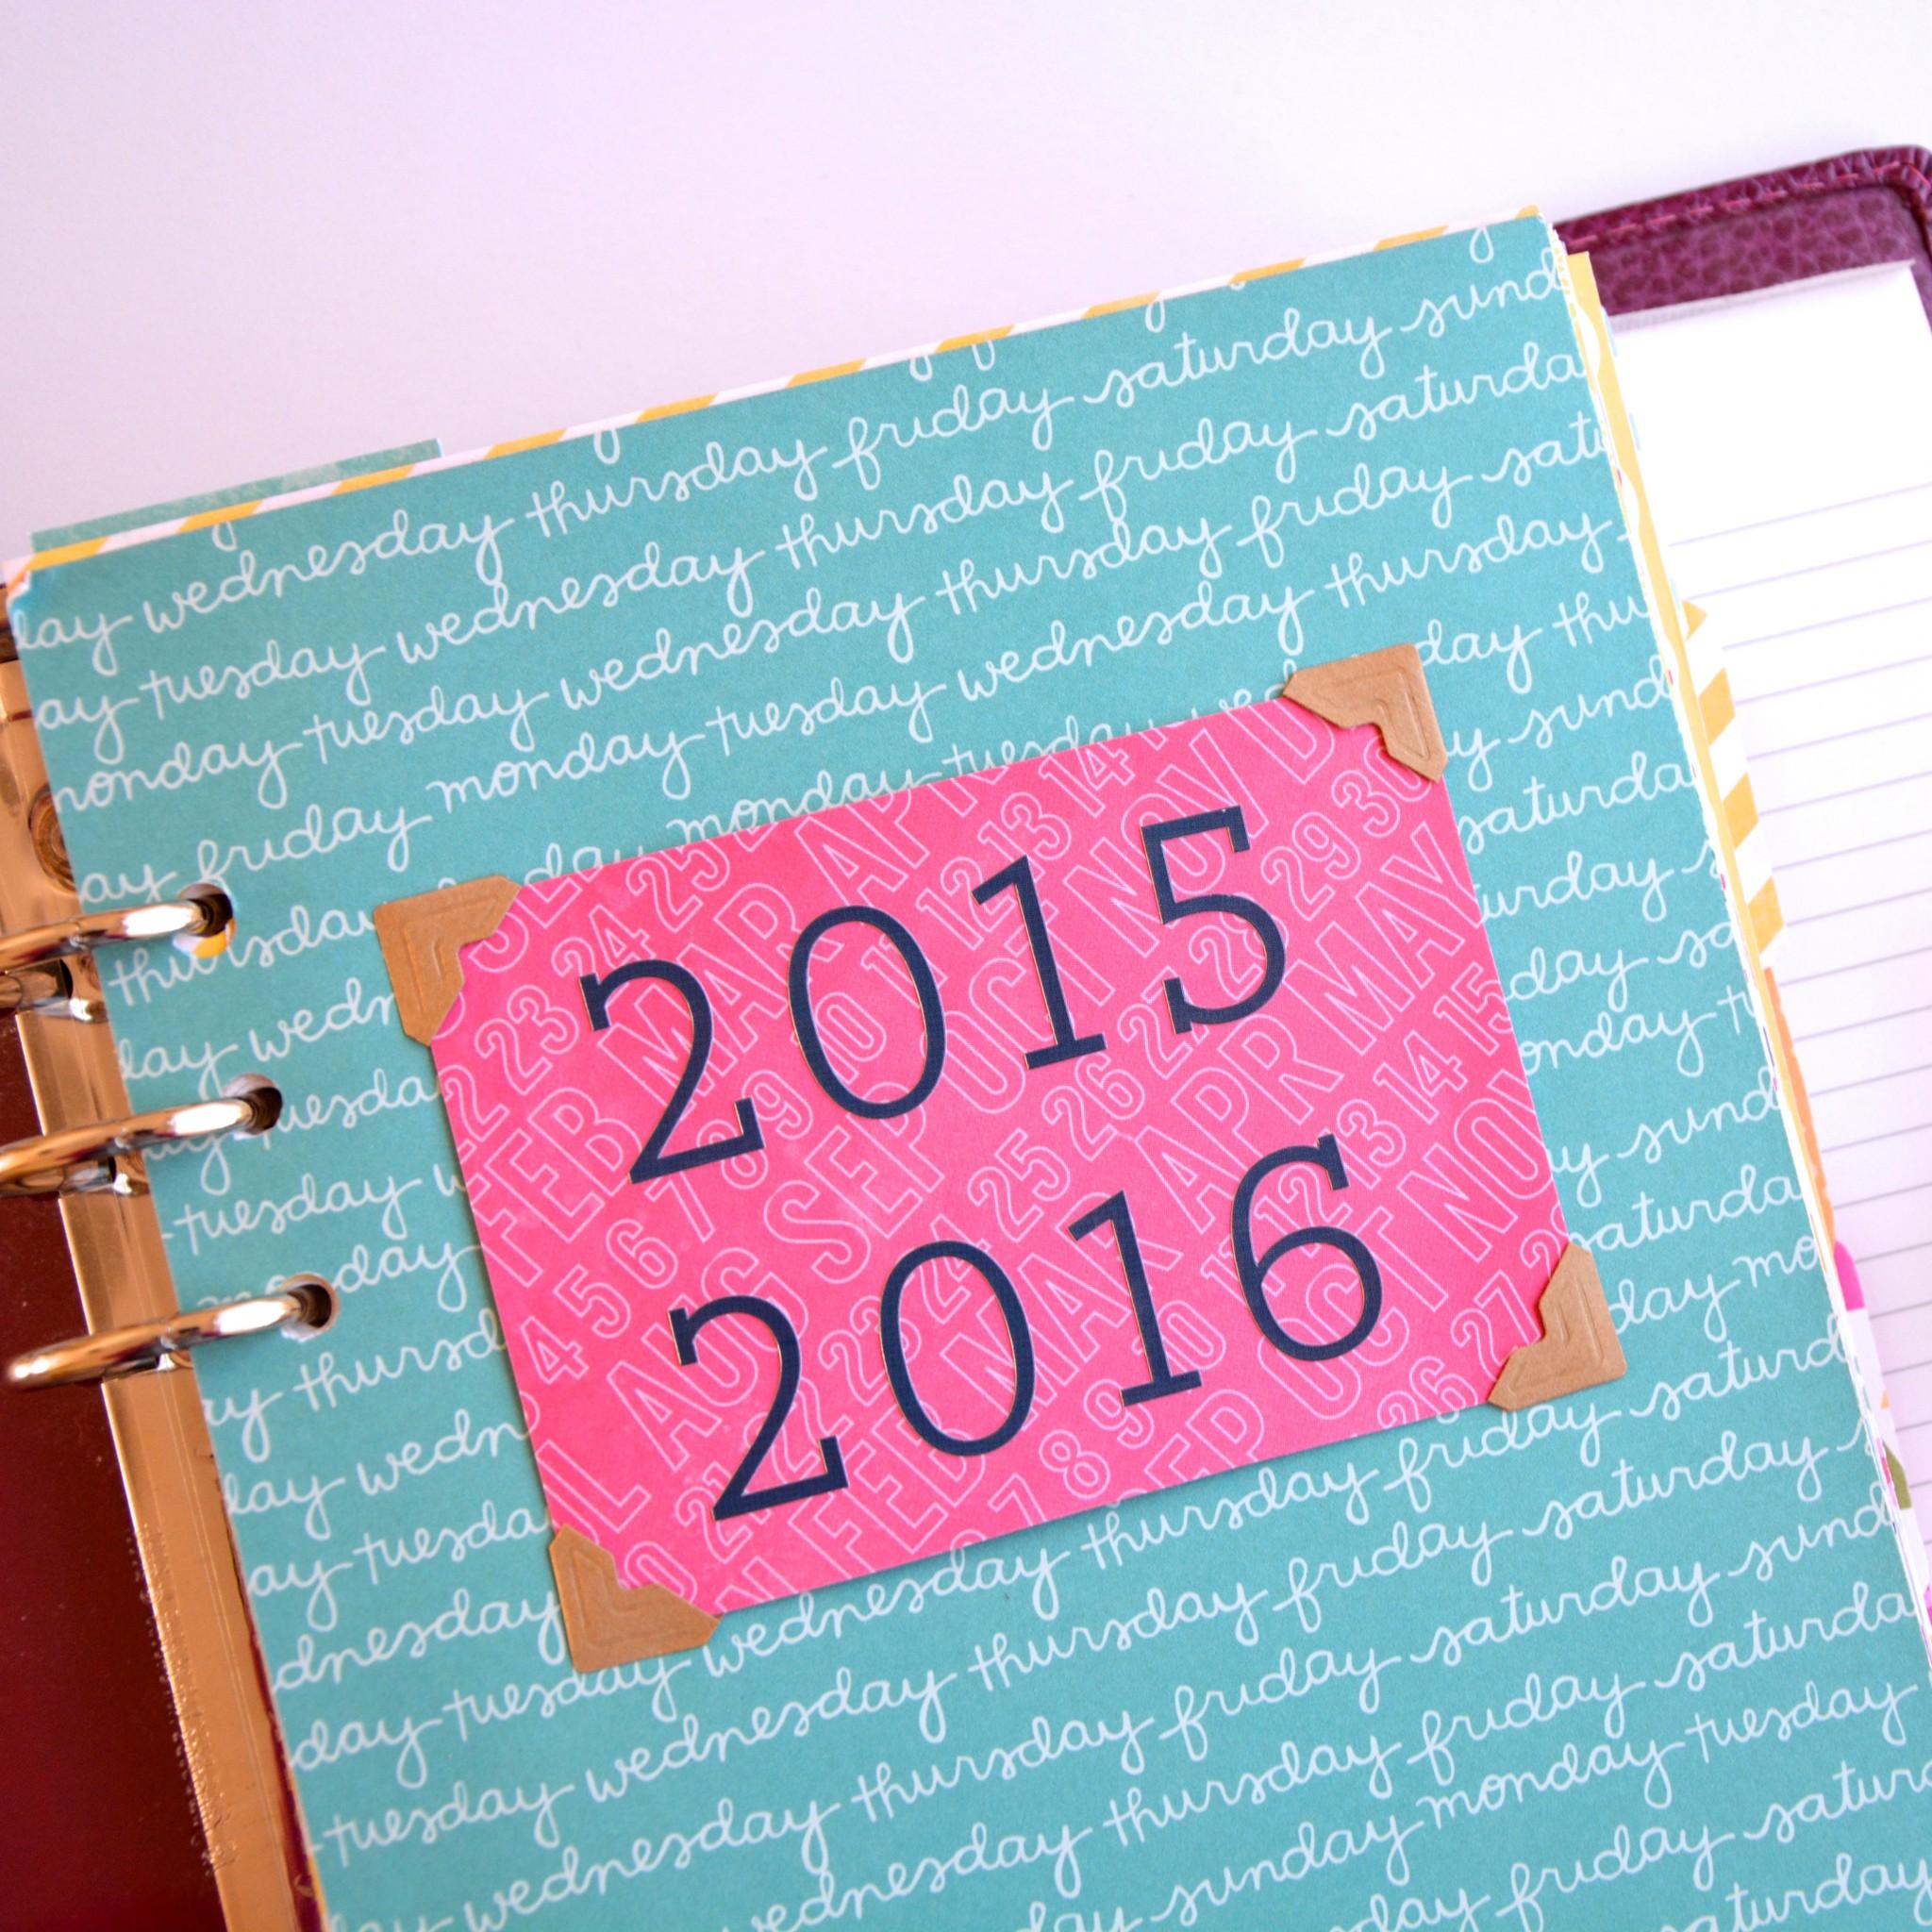 2015 Filofax page